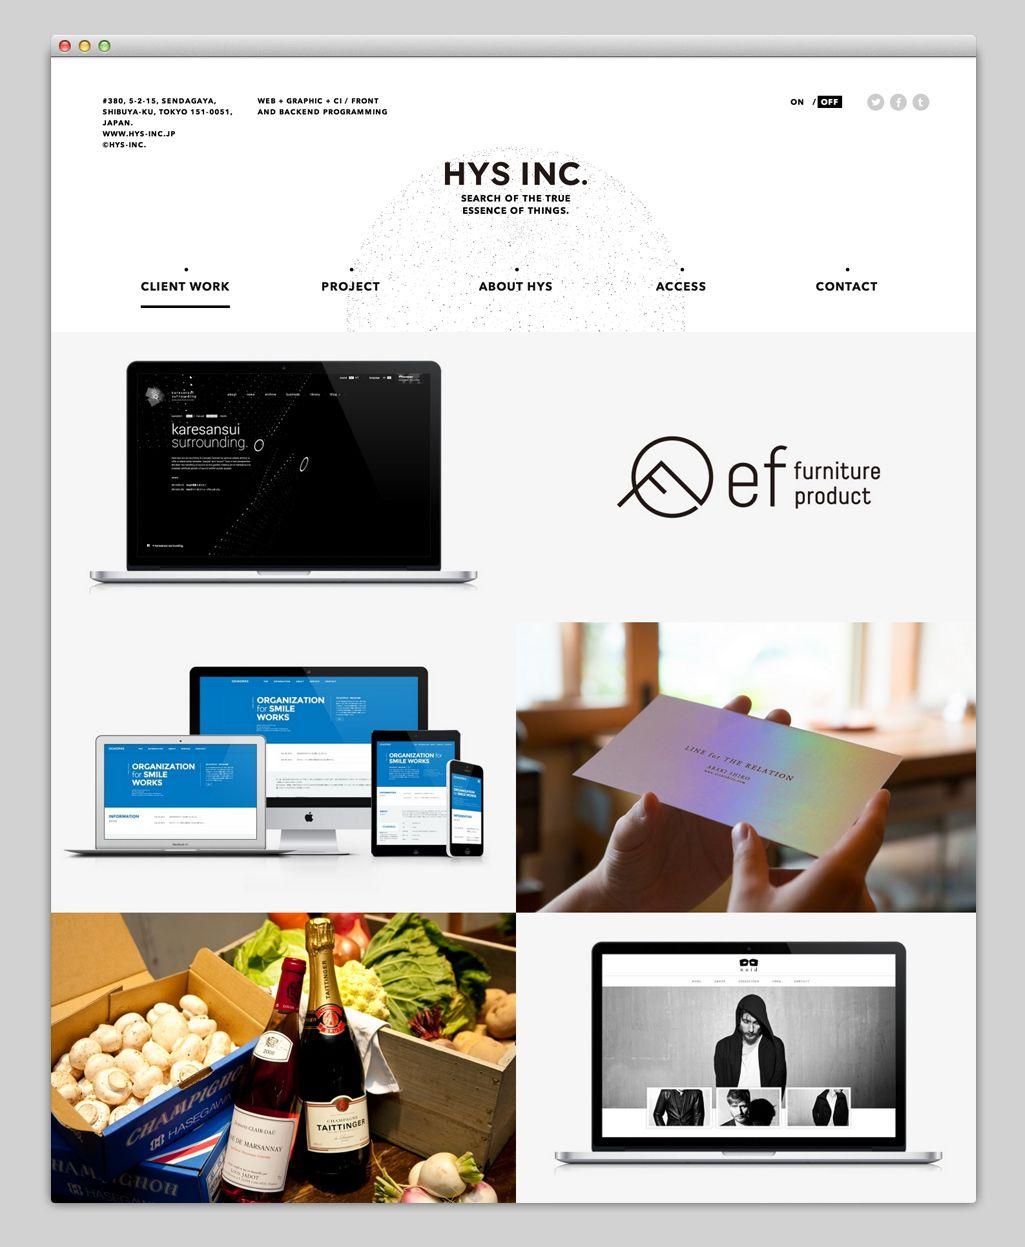 Mindsparkle Mag High Quality Designblog Highlighting The Best Of Beautiful Design Website And Video Projects Creative Websites Web Design Inspiration Web Design